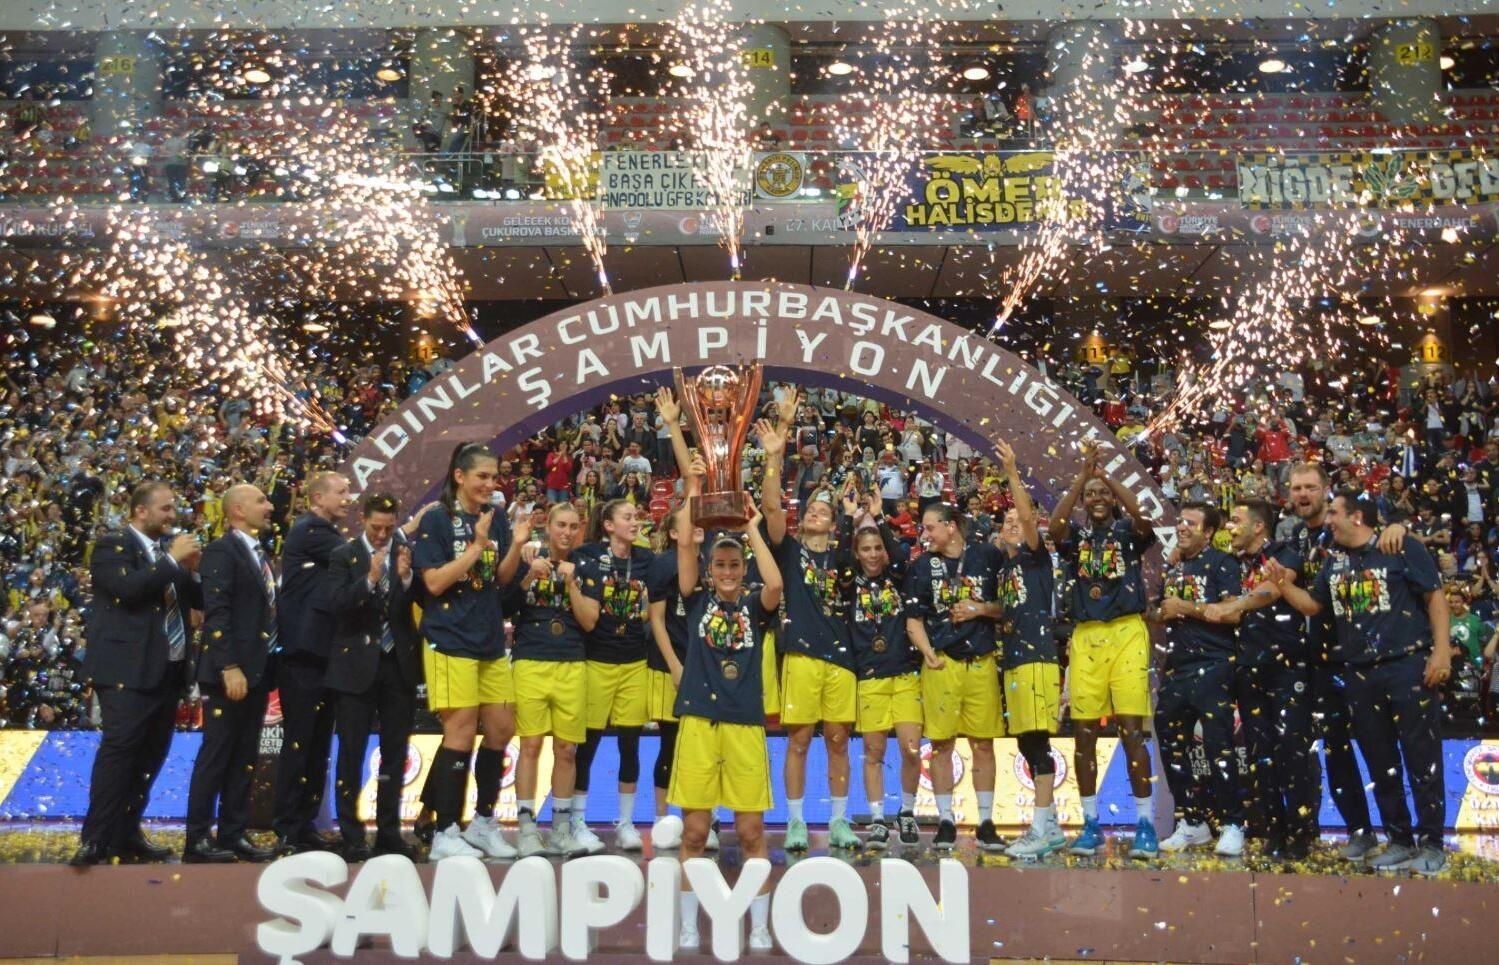 Fenerbahçe - Çukurova Basketbol maç sonucu: 86-62